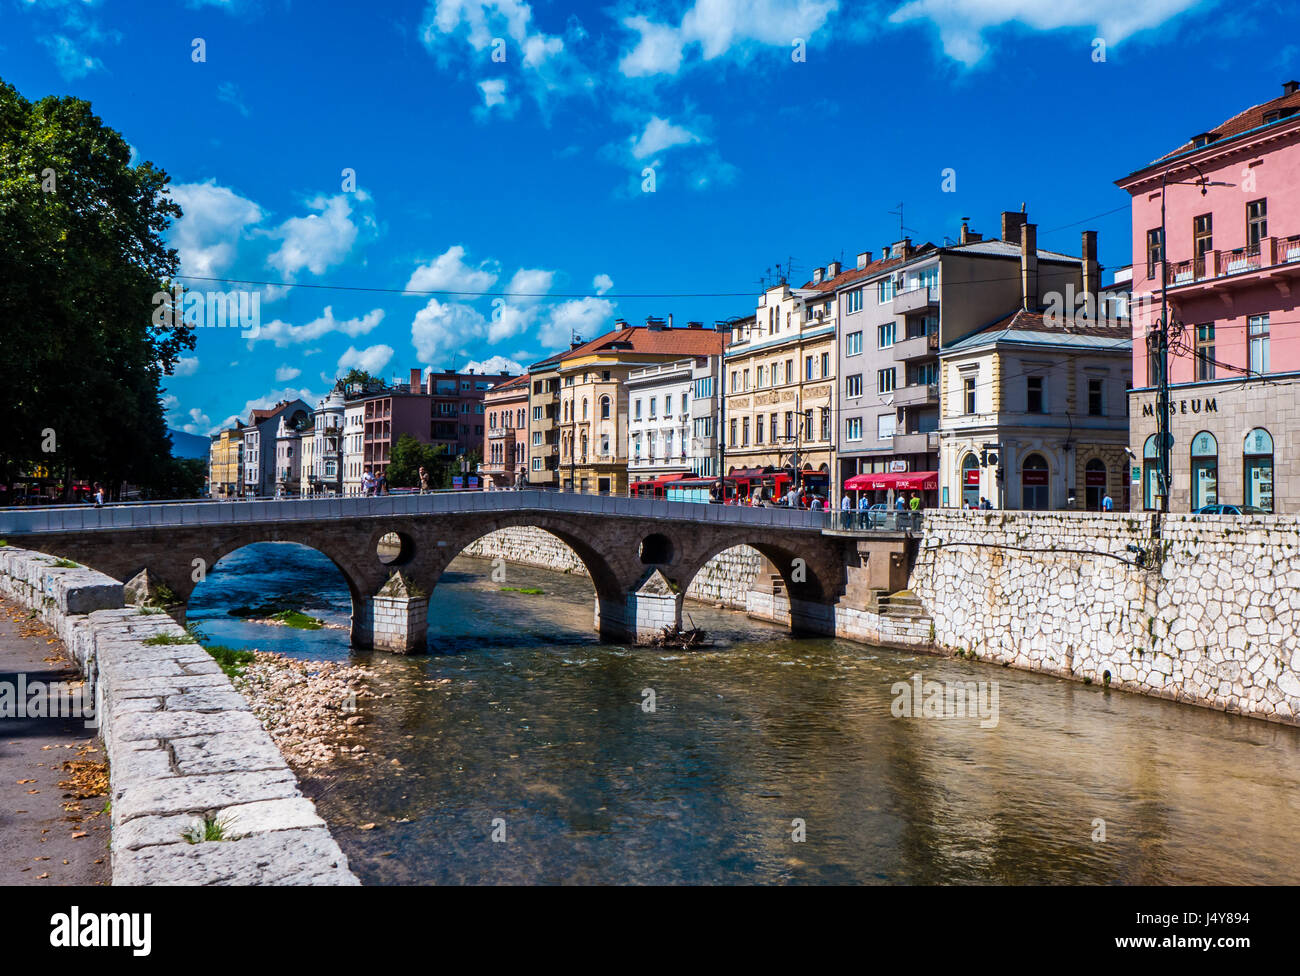 Sarajevo, Bosnia and Herzegovina - 12 September 2014 - Sarajevo and river Miljacka on a sunny day, with people and - Stock Image